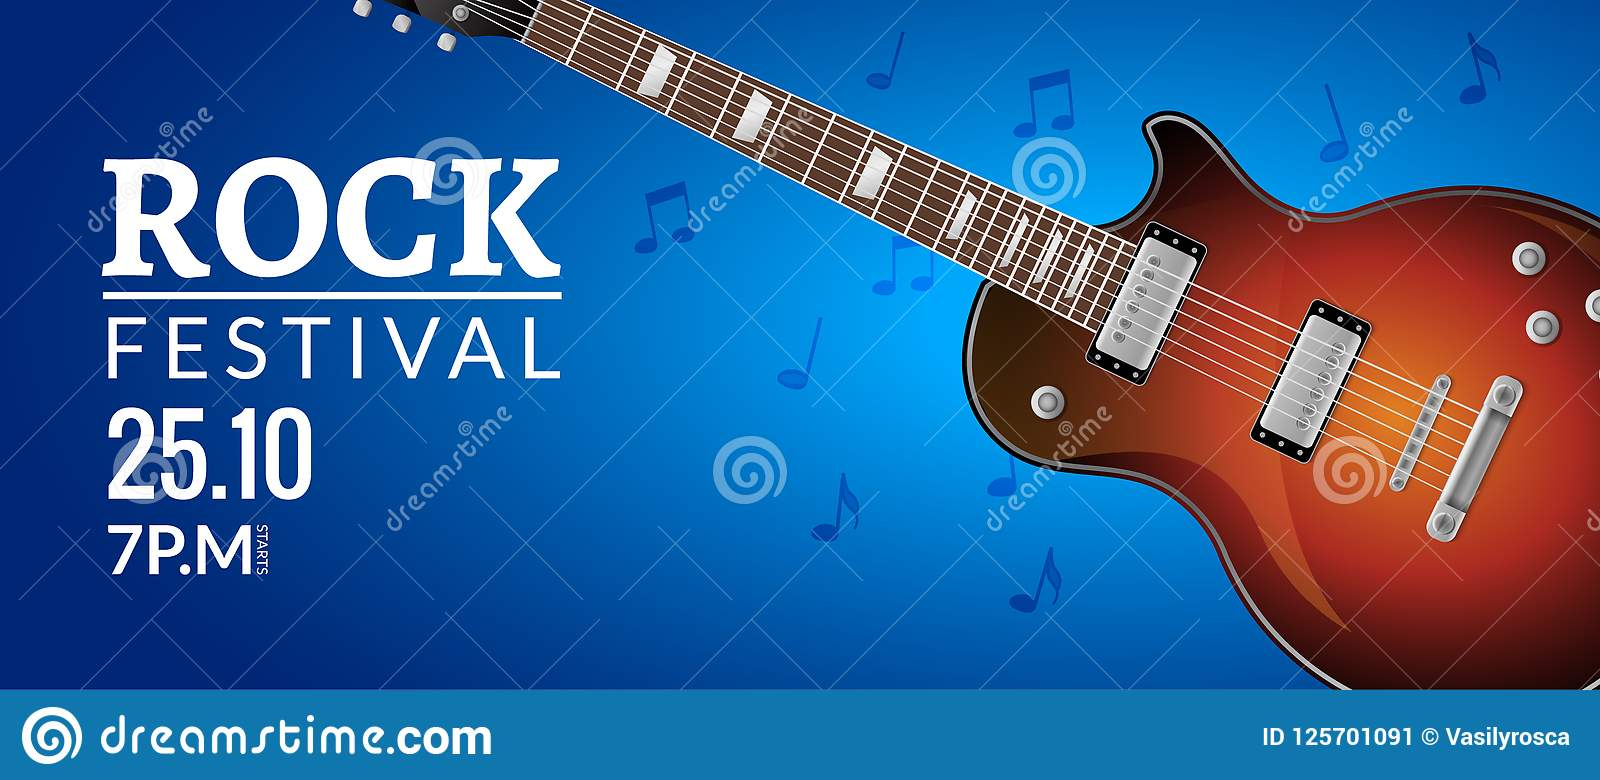 rock festival flyer event design template with guitar rock banner